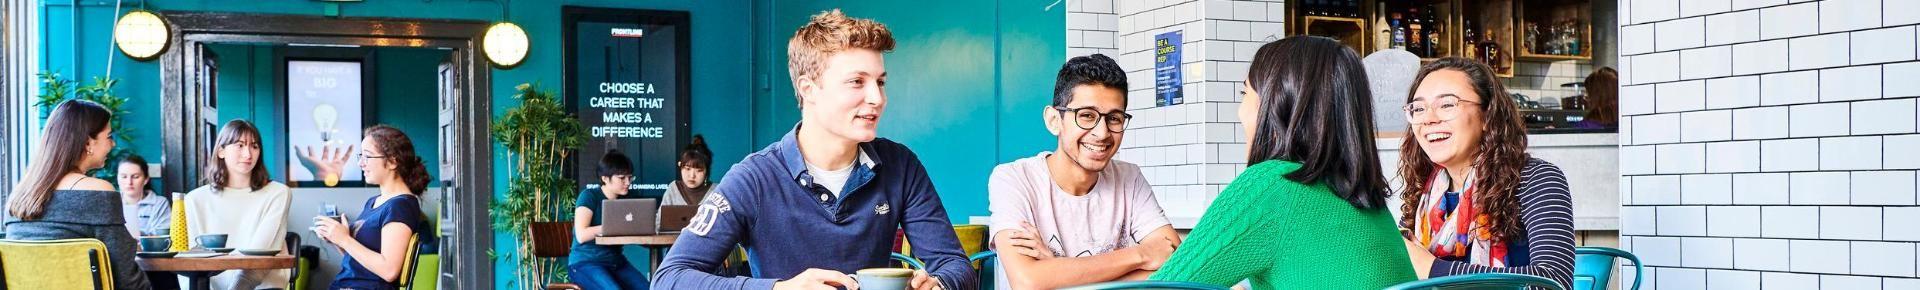 Students in Kingsgate Bar